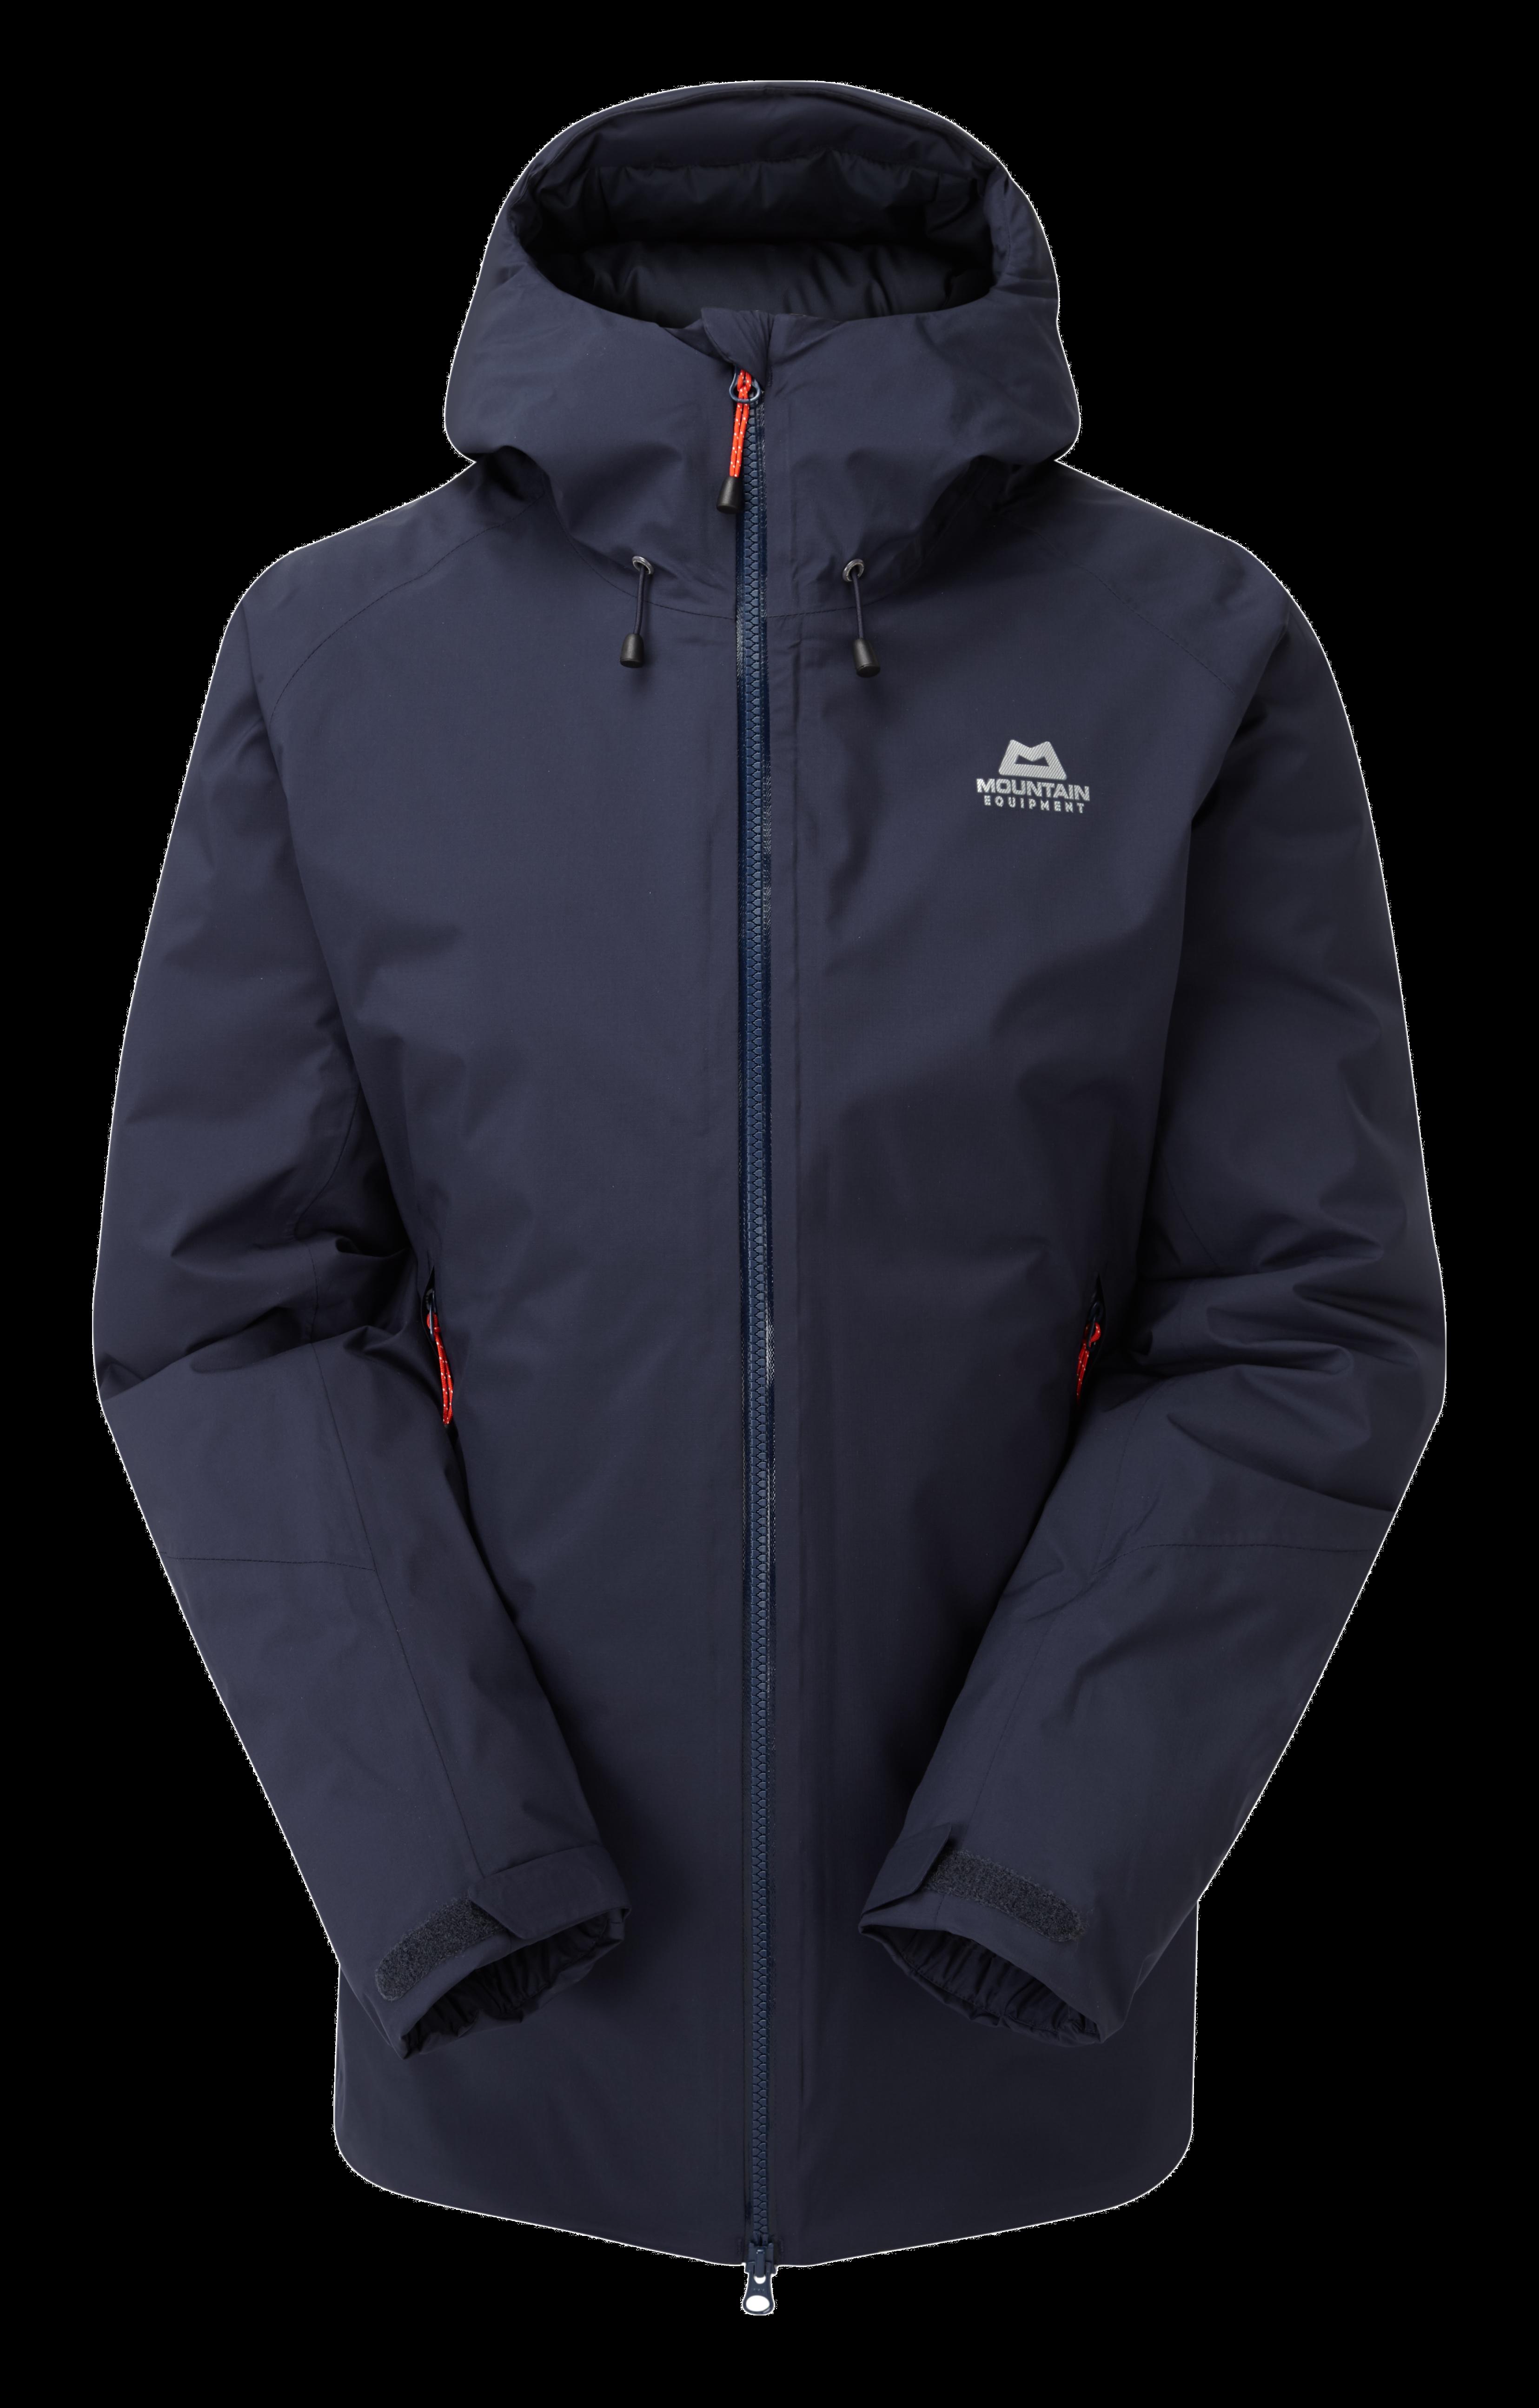 Mountain Equipment Triton Jacket - Hardshelljacke - Damen